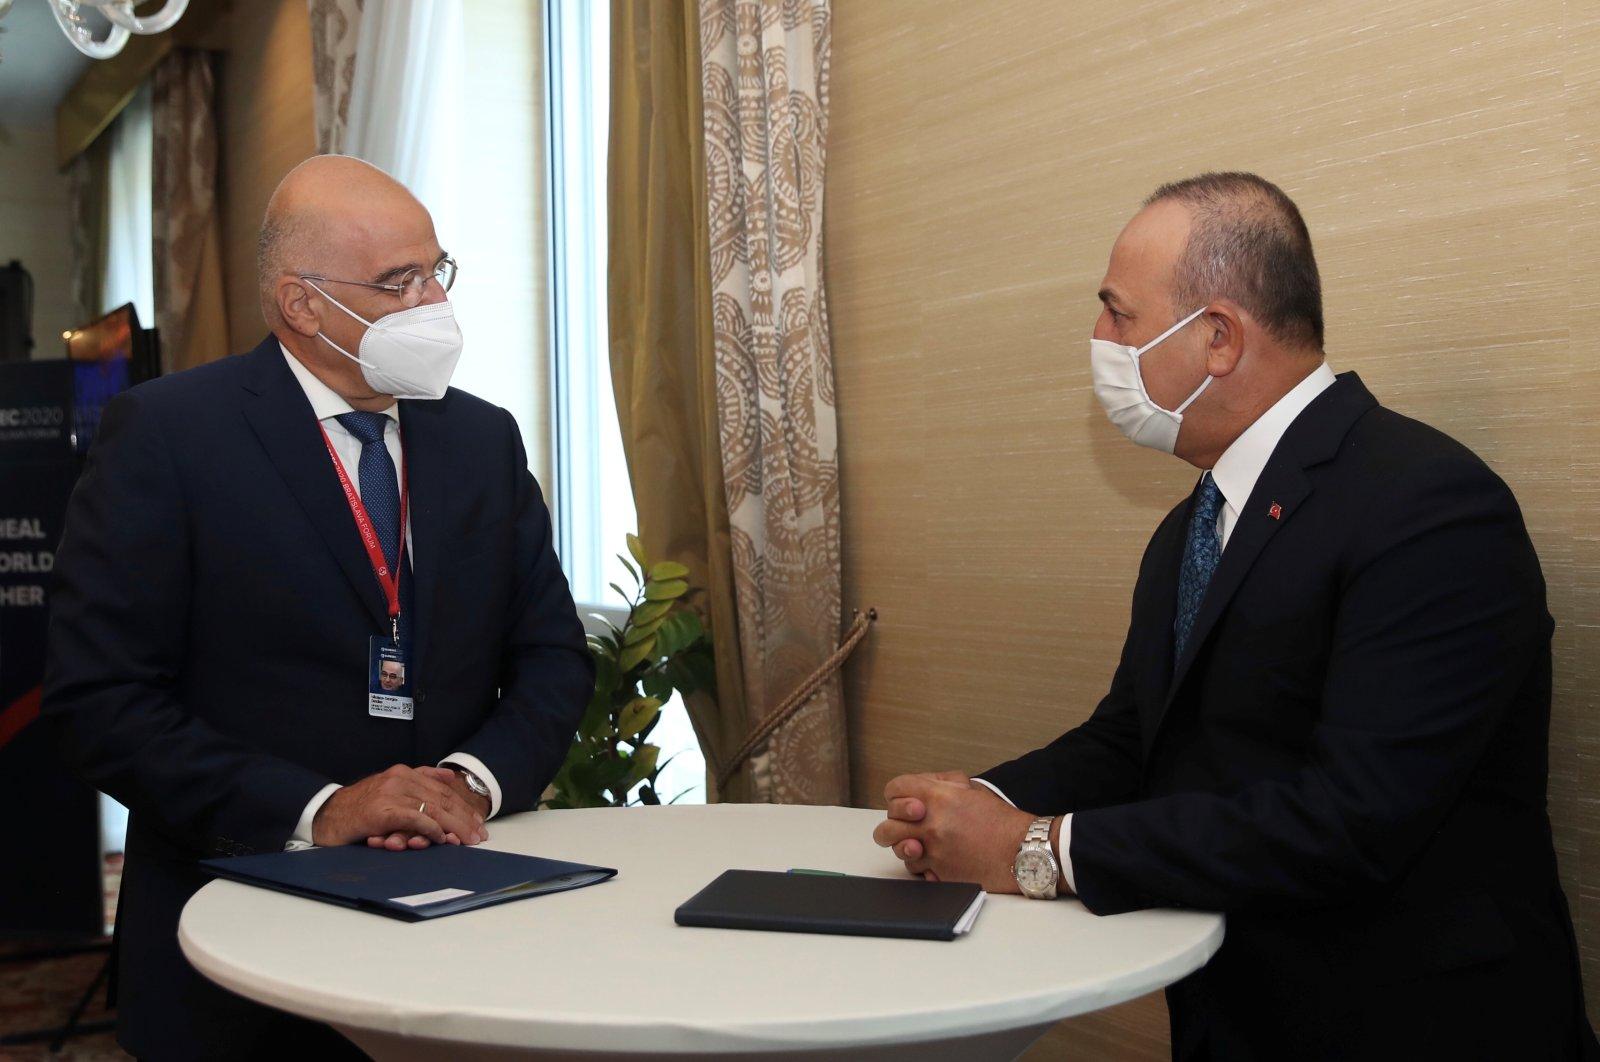 Foreign Minister Mevlüt Çavuşoğlu meets with his Greek counterpart Nikos Dendias on the sidelines of the Global Security Forum in Bratislava, Slovakia, Oct. 8, 2020. (Turkish MFA via Reuters)